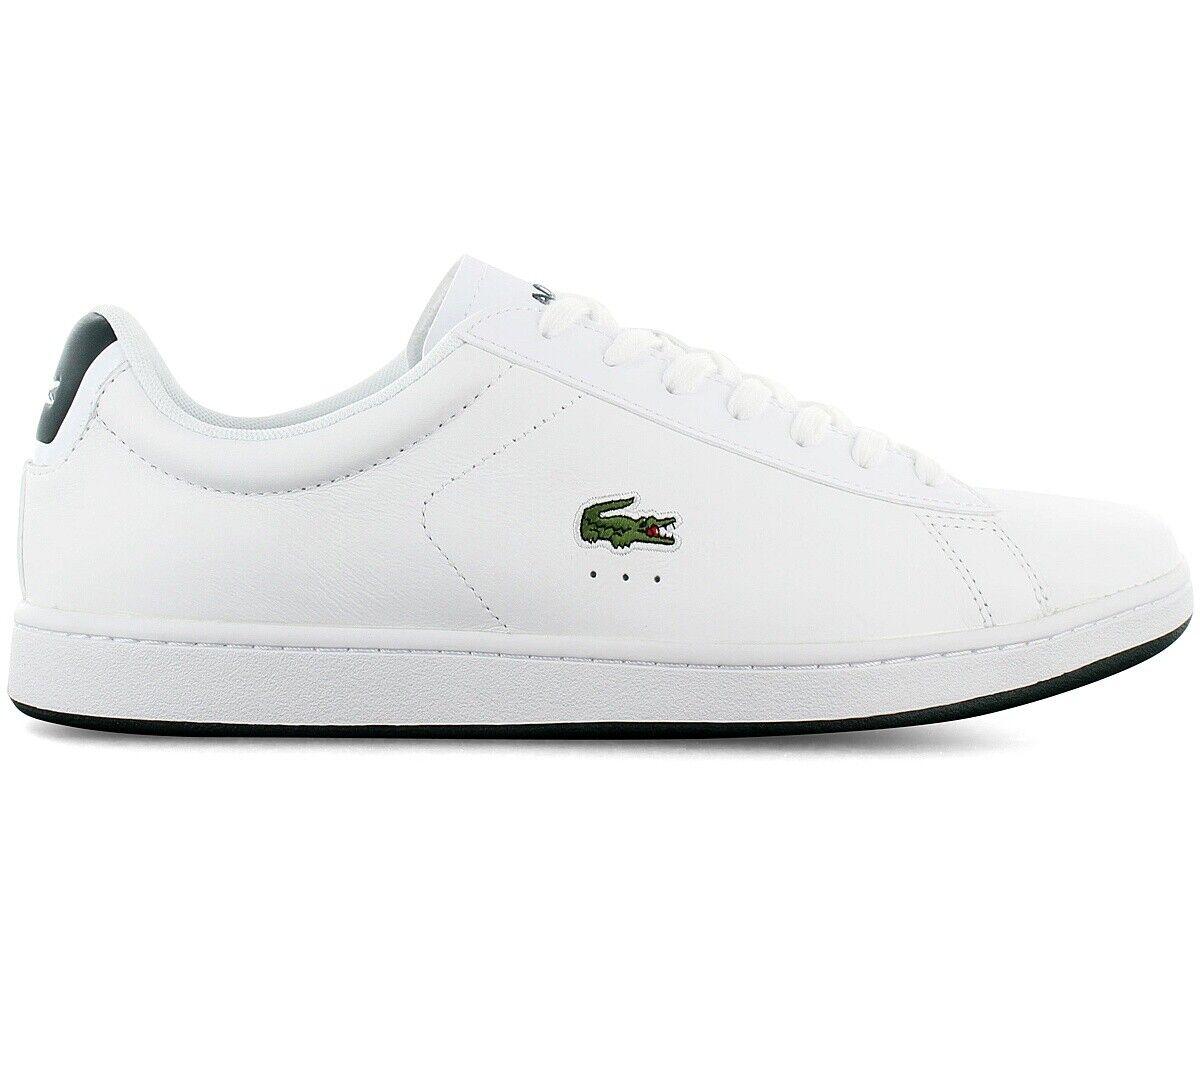 Lacoste carnaby evo 0721 SMA Men's Sneaker White 7-41SMA00031R5 Casual Shoes